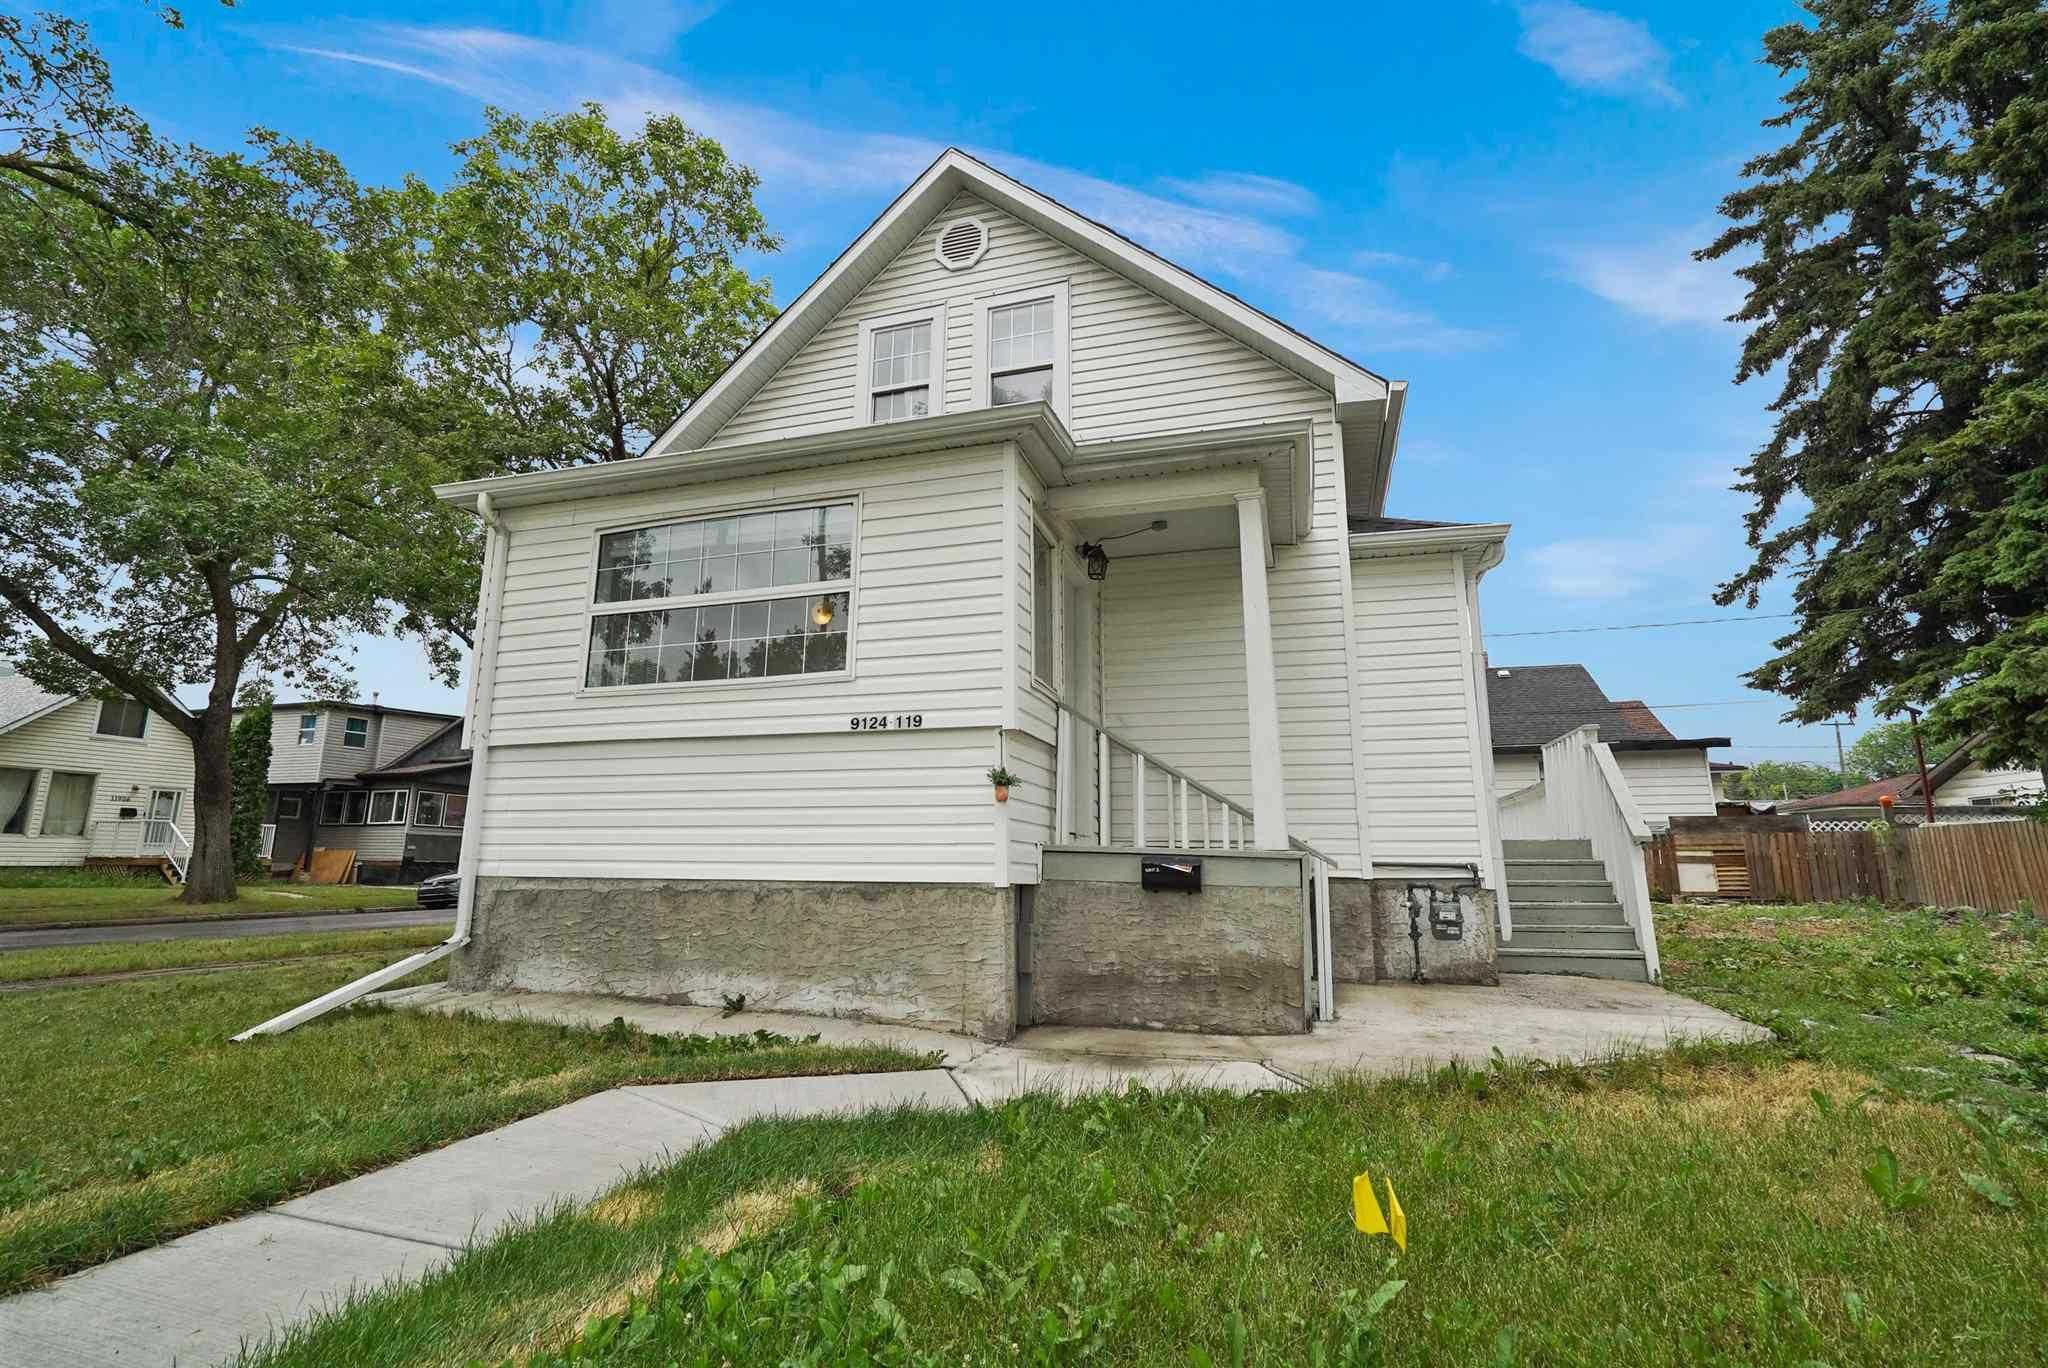 Main Photo: 9124 119 Avenue in Edmonton: Zone 05 House for sale : MLS®# E4253427